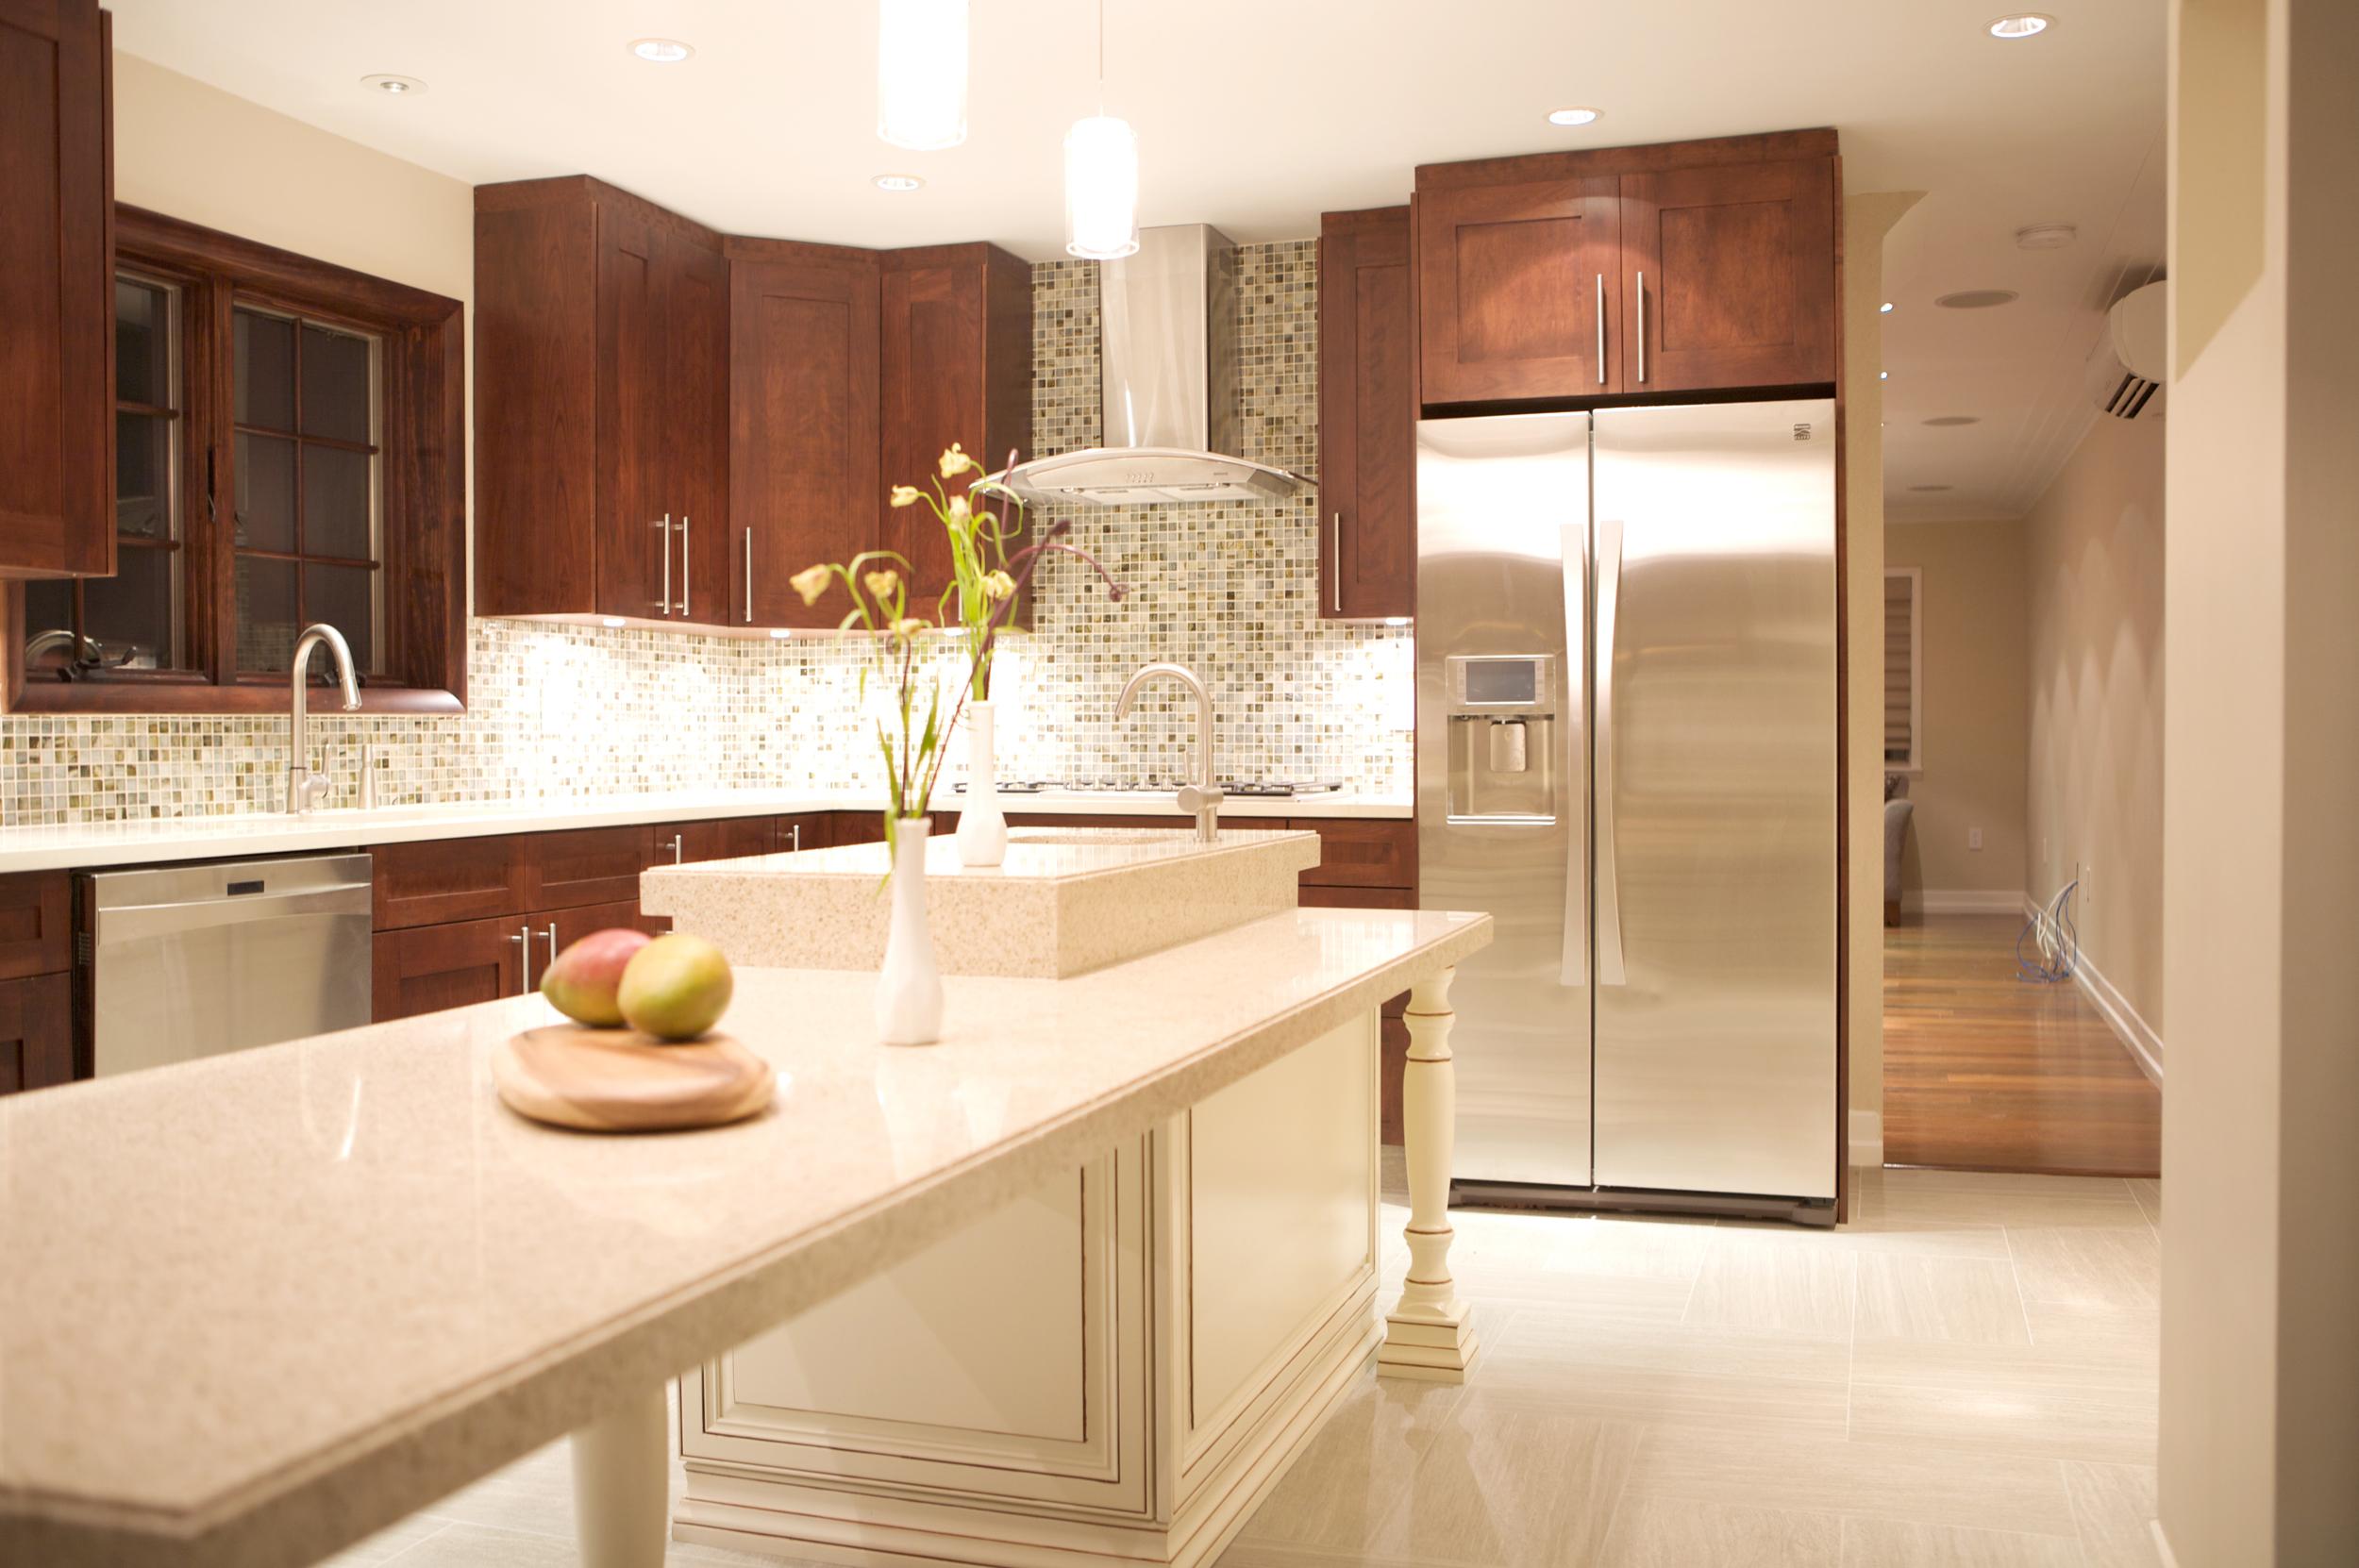 """Brooklyn interior design project: kitchen renovation"""